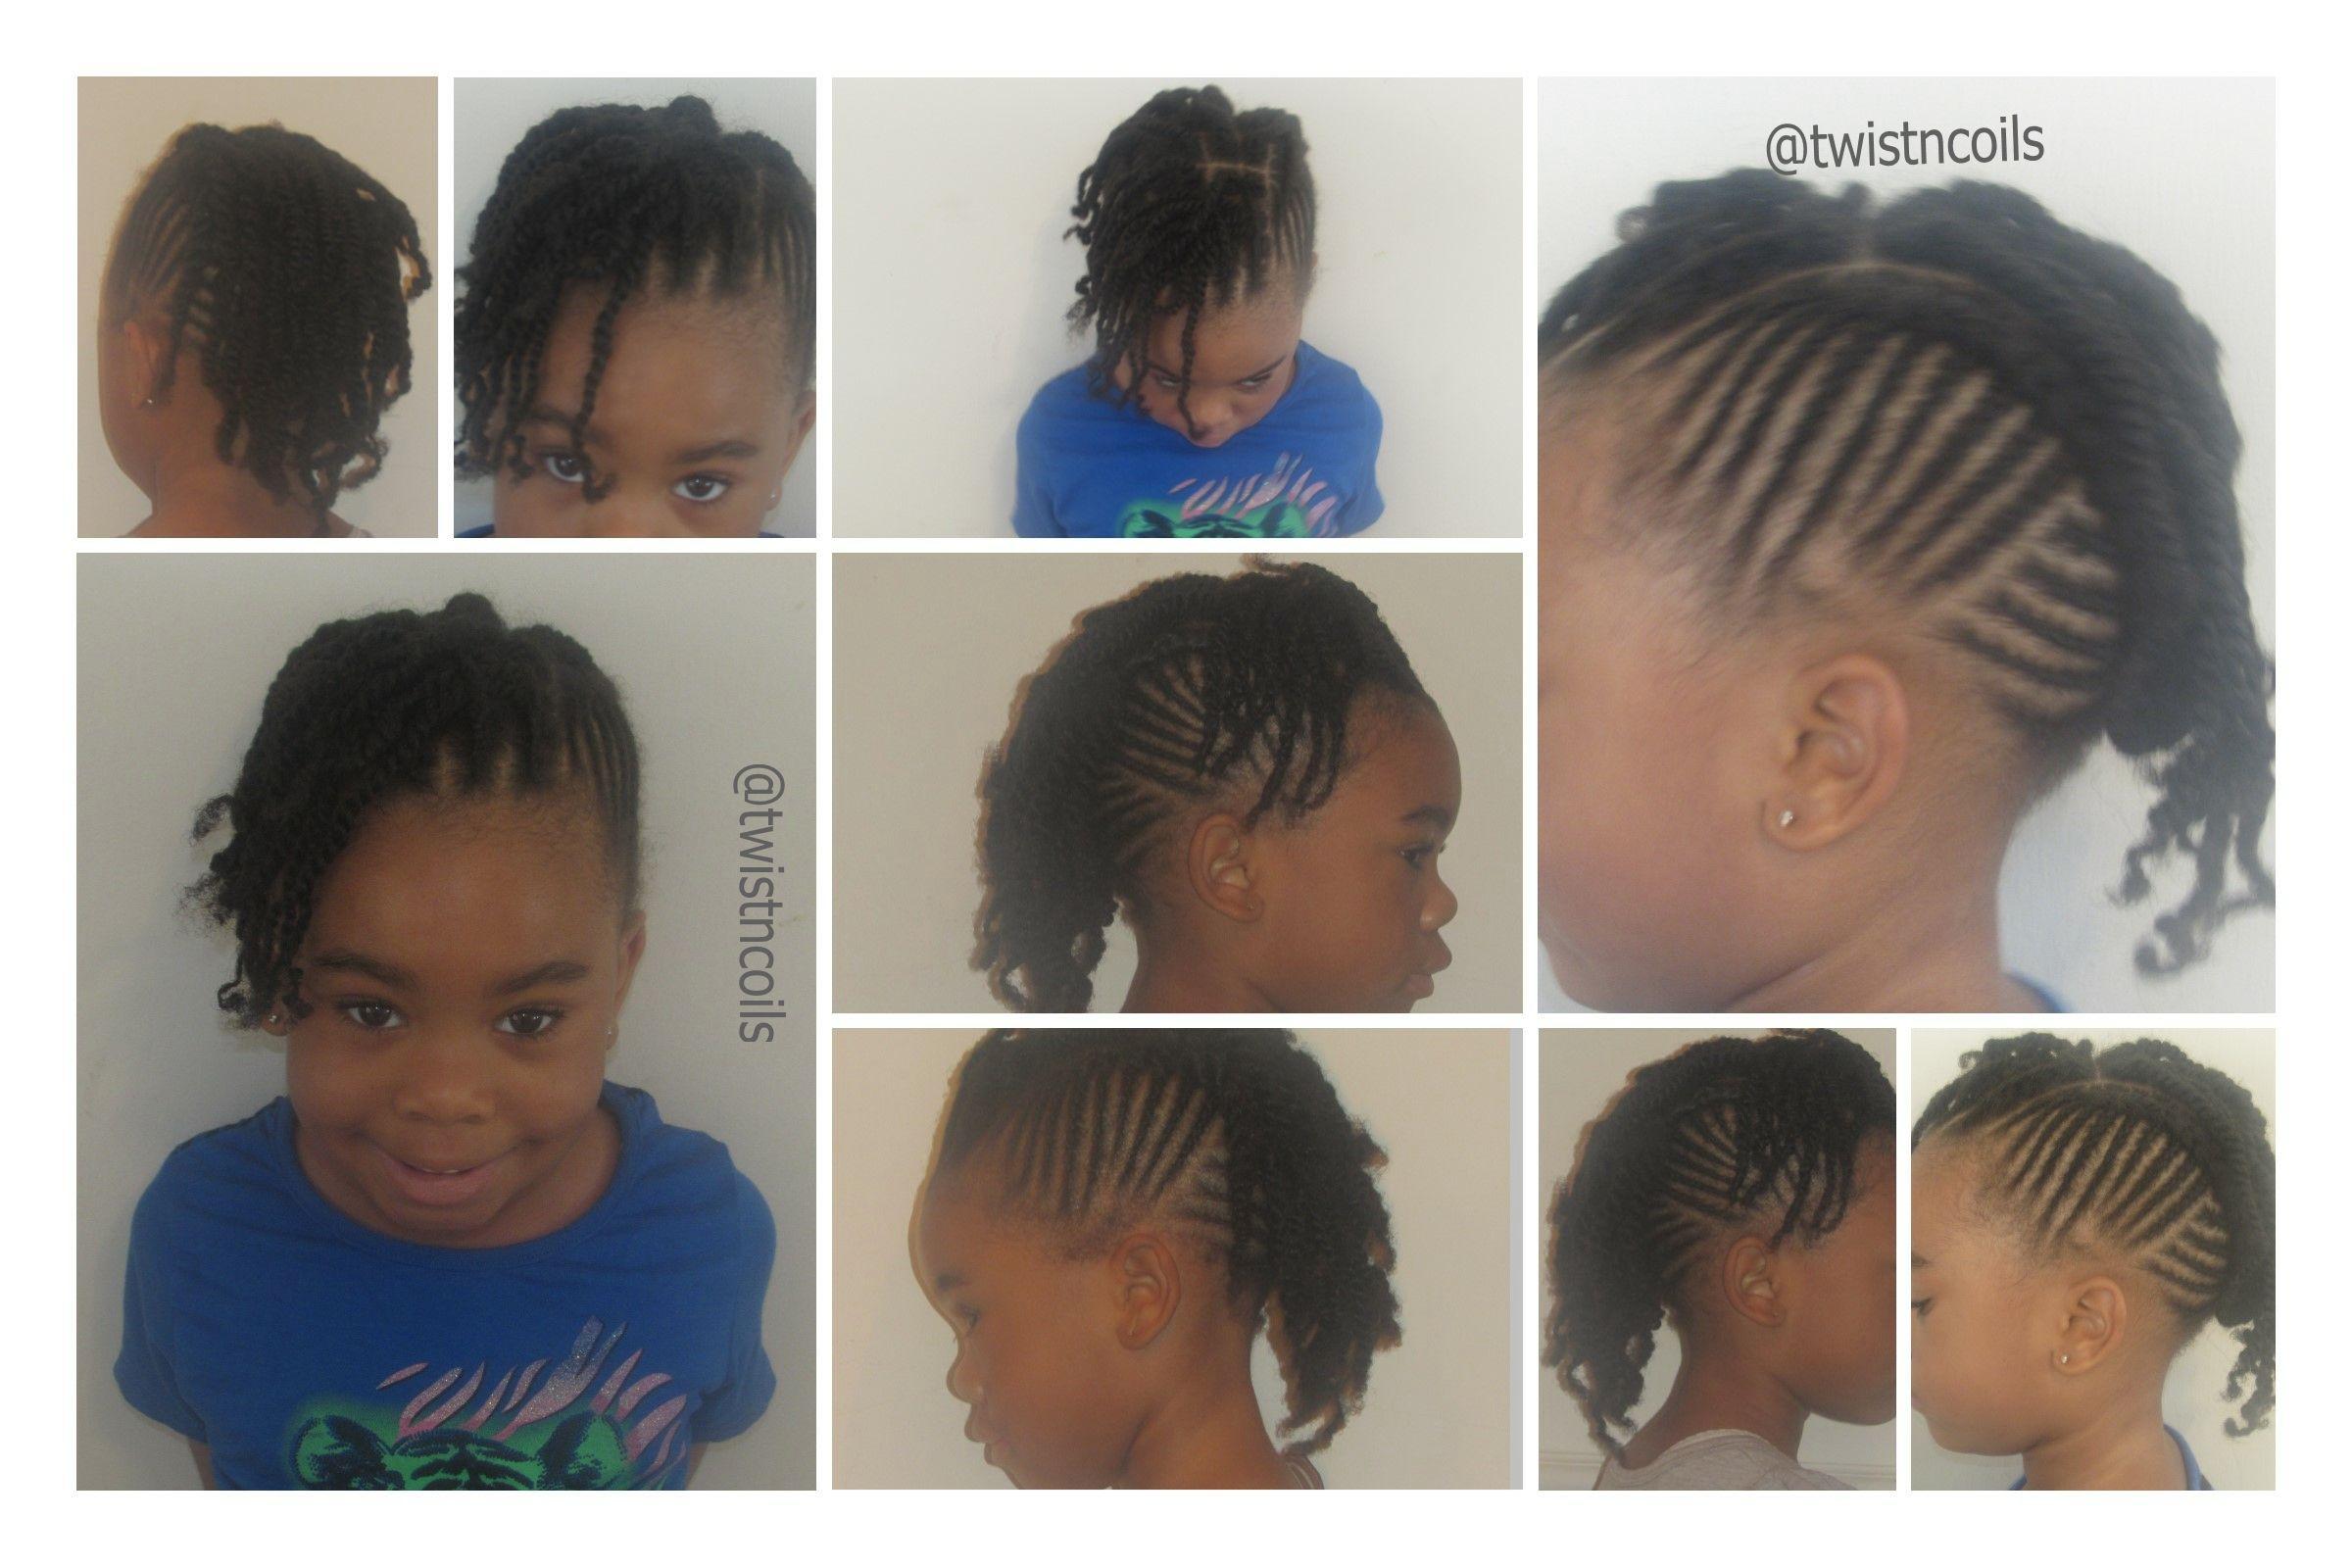 Braided mohawk tnc kids natural hairstyles pinterest braided